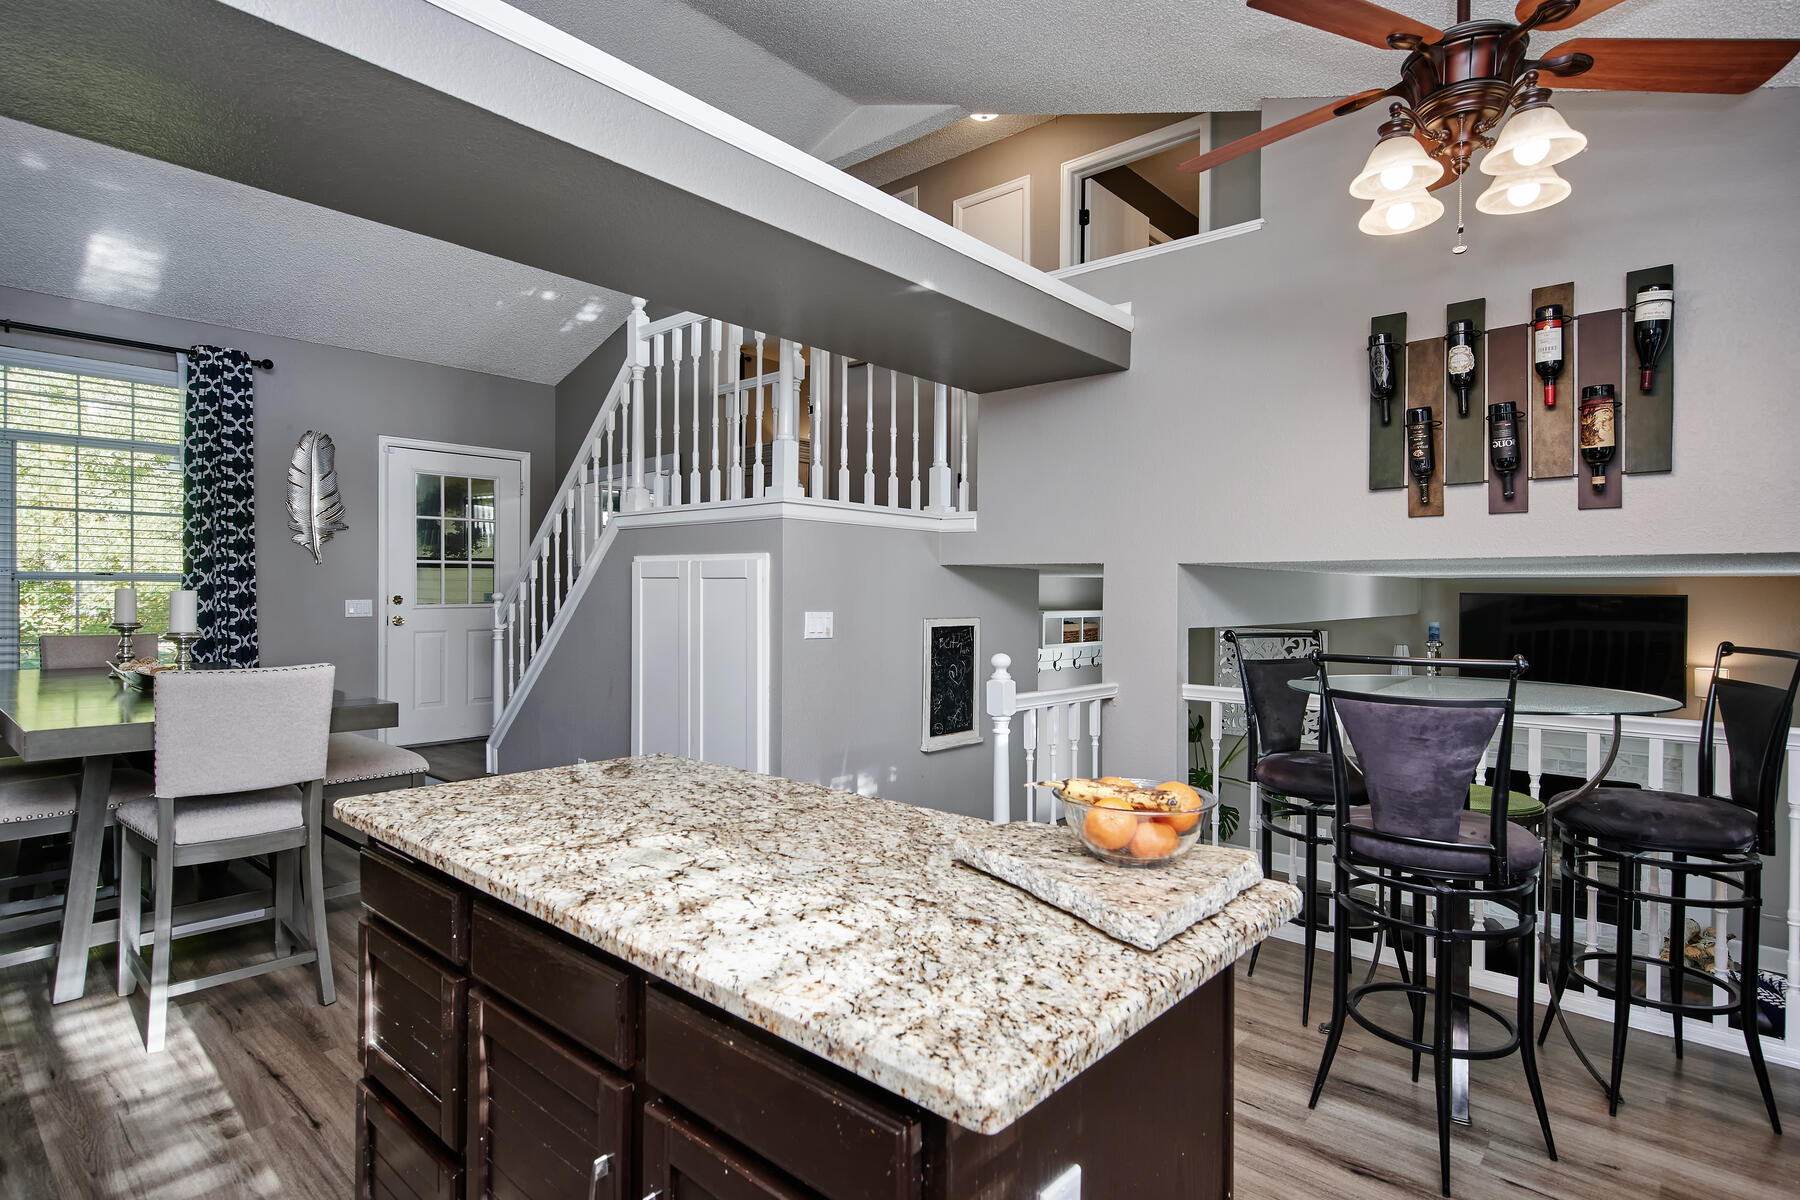 Nice Open Floorplan with Vaulted Ceilings